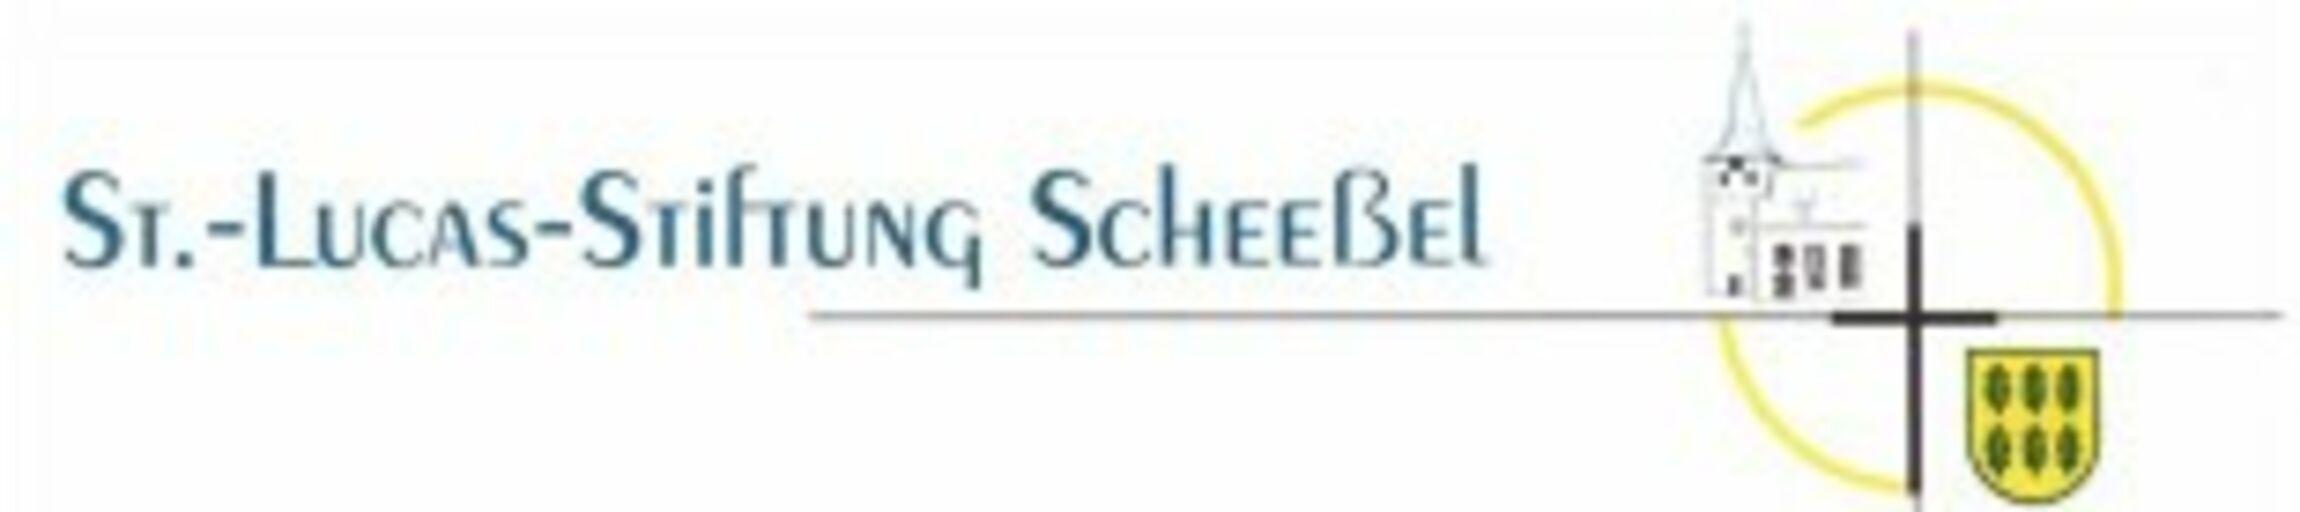 logo stiftung